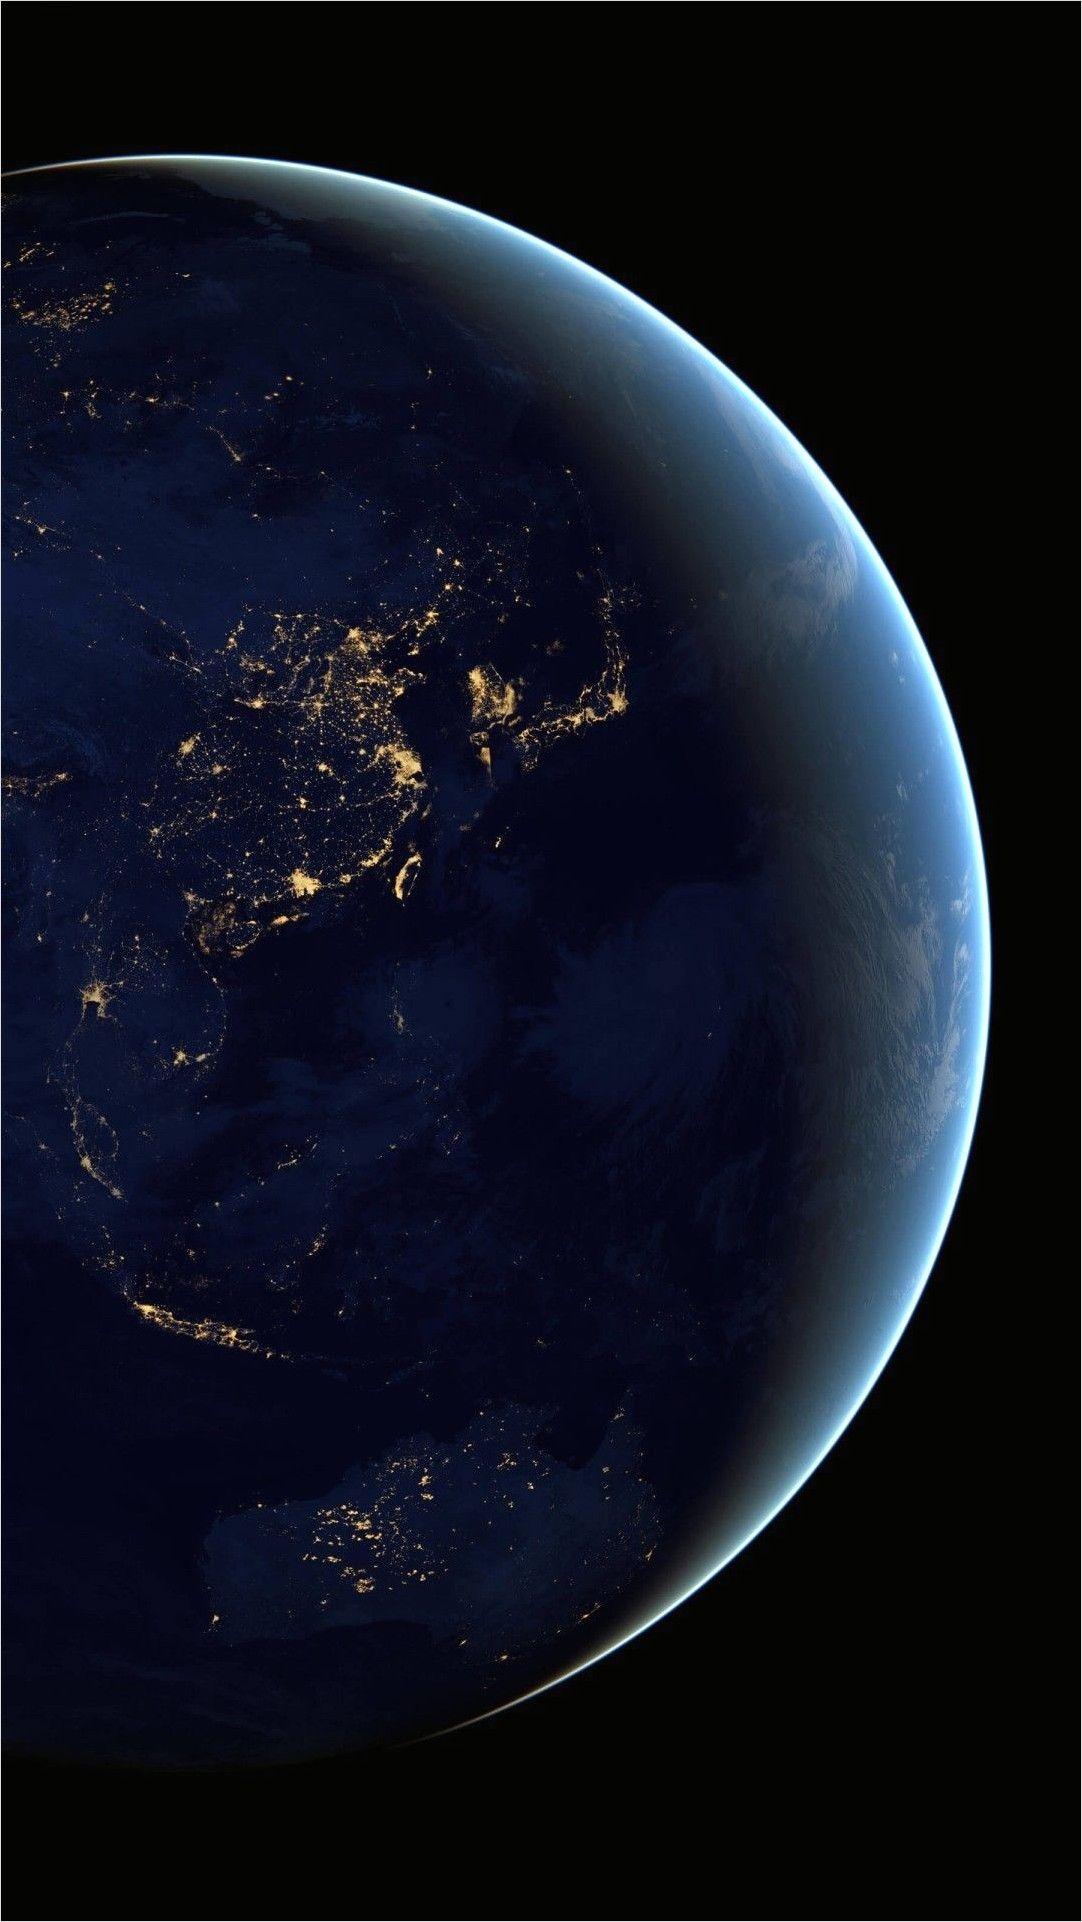 4k Earth Mobile Wallpaper In 2020 Uhd Wallpaper Wallpaper Earth Wallpaper Space